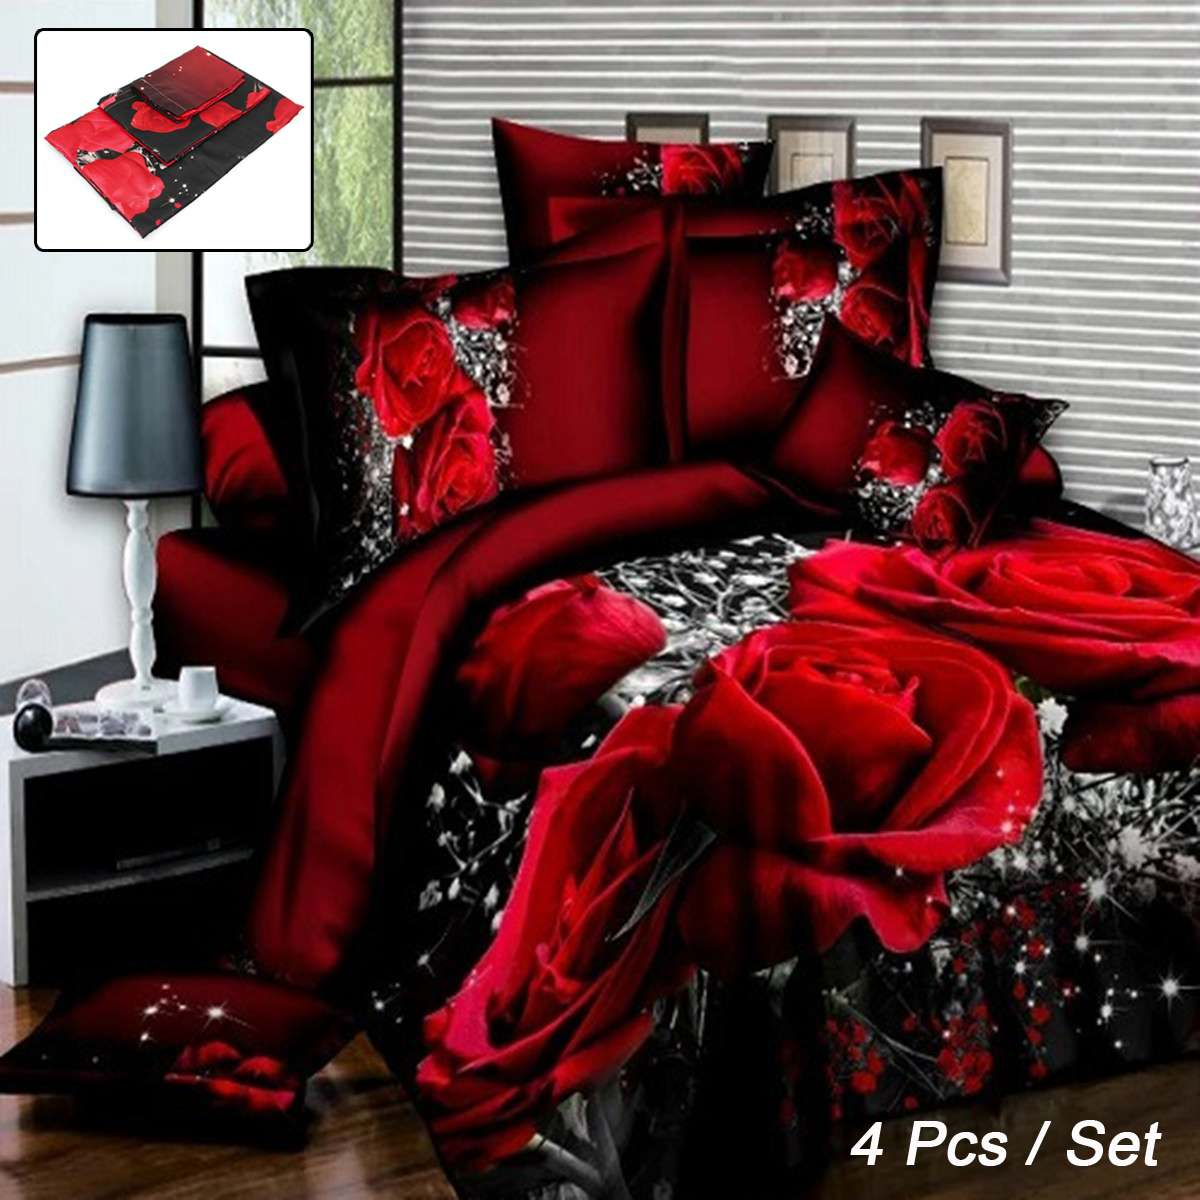 Cotton 3D Rose Bedding Sets Soft Duvet Cover Bedsheet Pillowcase Bedclothes Queen King Twin Size Bed Linen Set Wedding Gifts